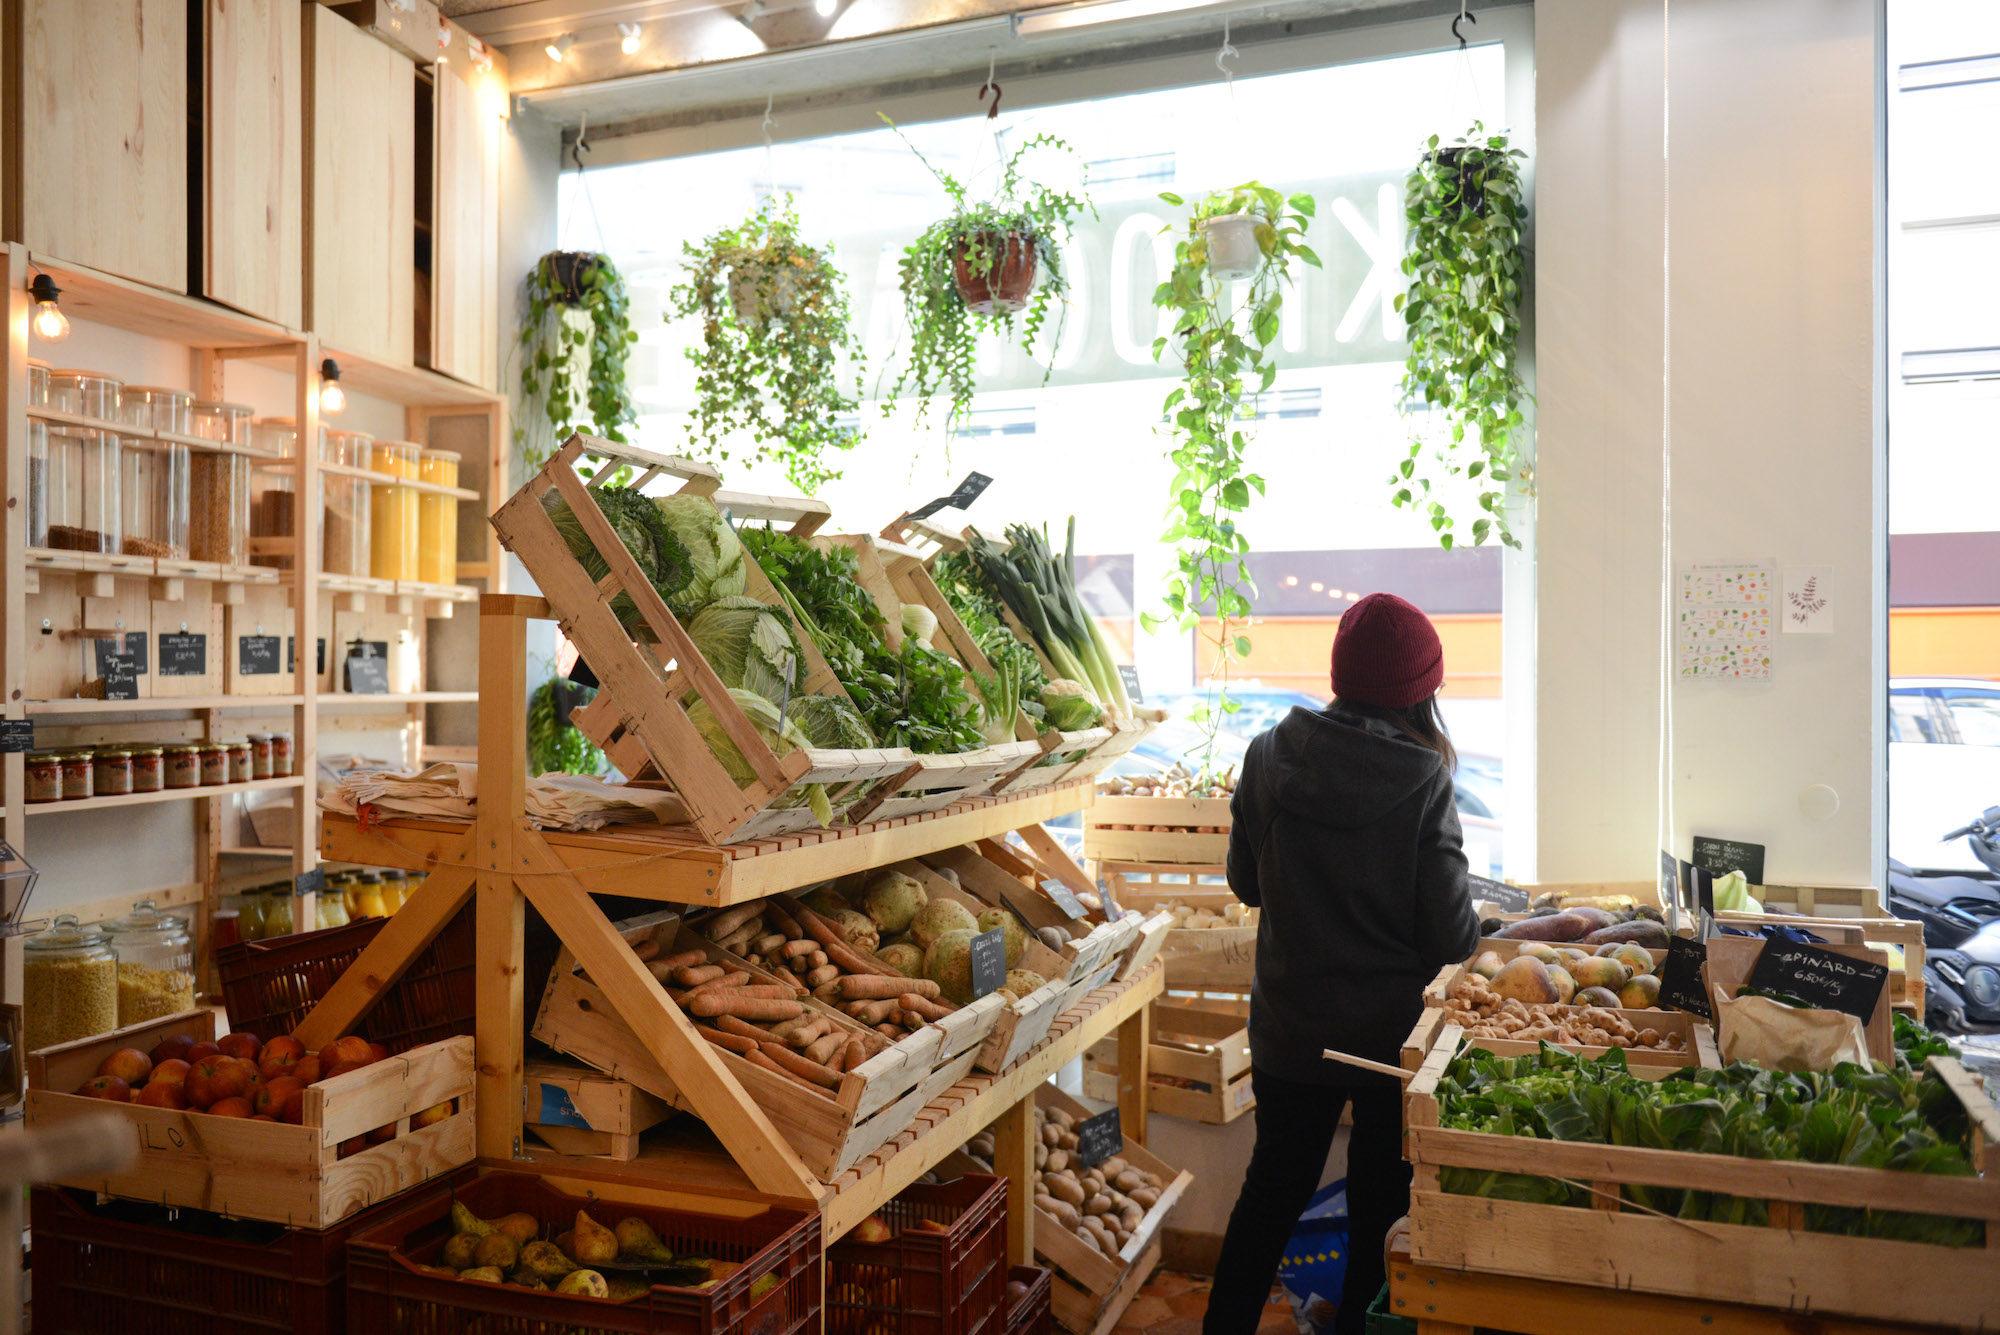 Epicerie Kilogramme Paris - Bulk Food Supermarket Shopping takes off